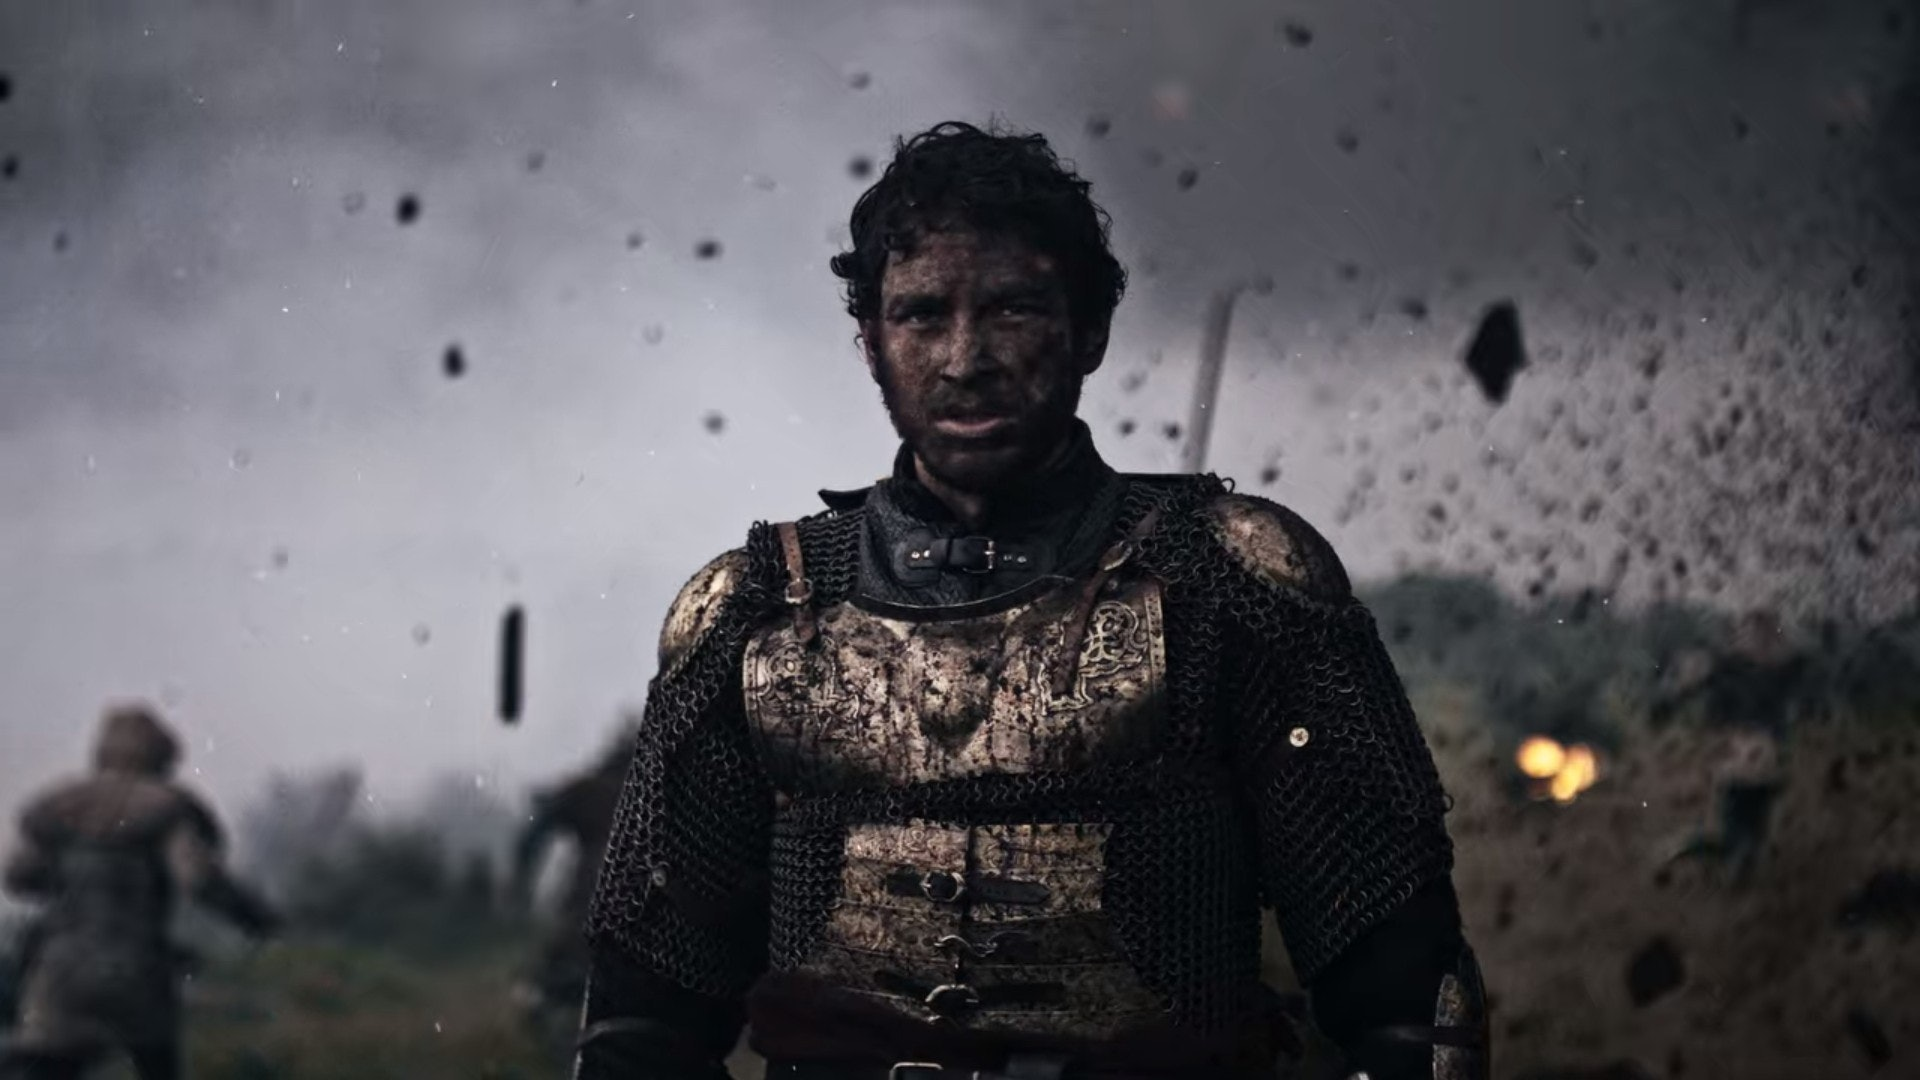 《Rise of Empires: Ottoman》主要講述鄂圖曼帝國的崛起,共6集的迷你劇已於1月24日在Netflix上架。(劇照)